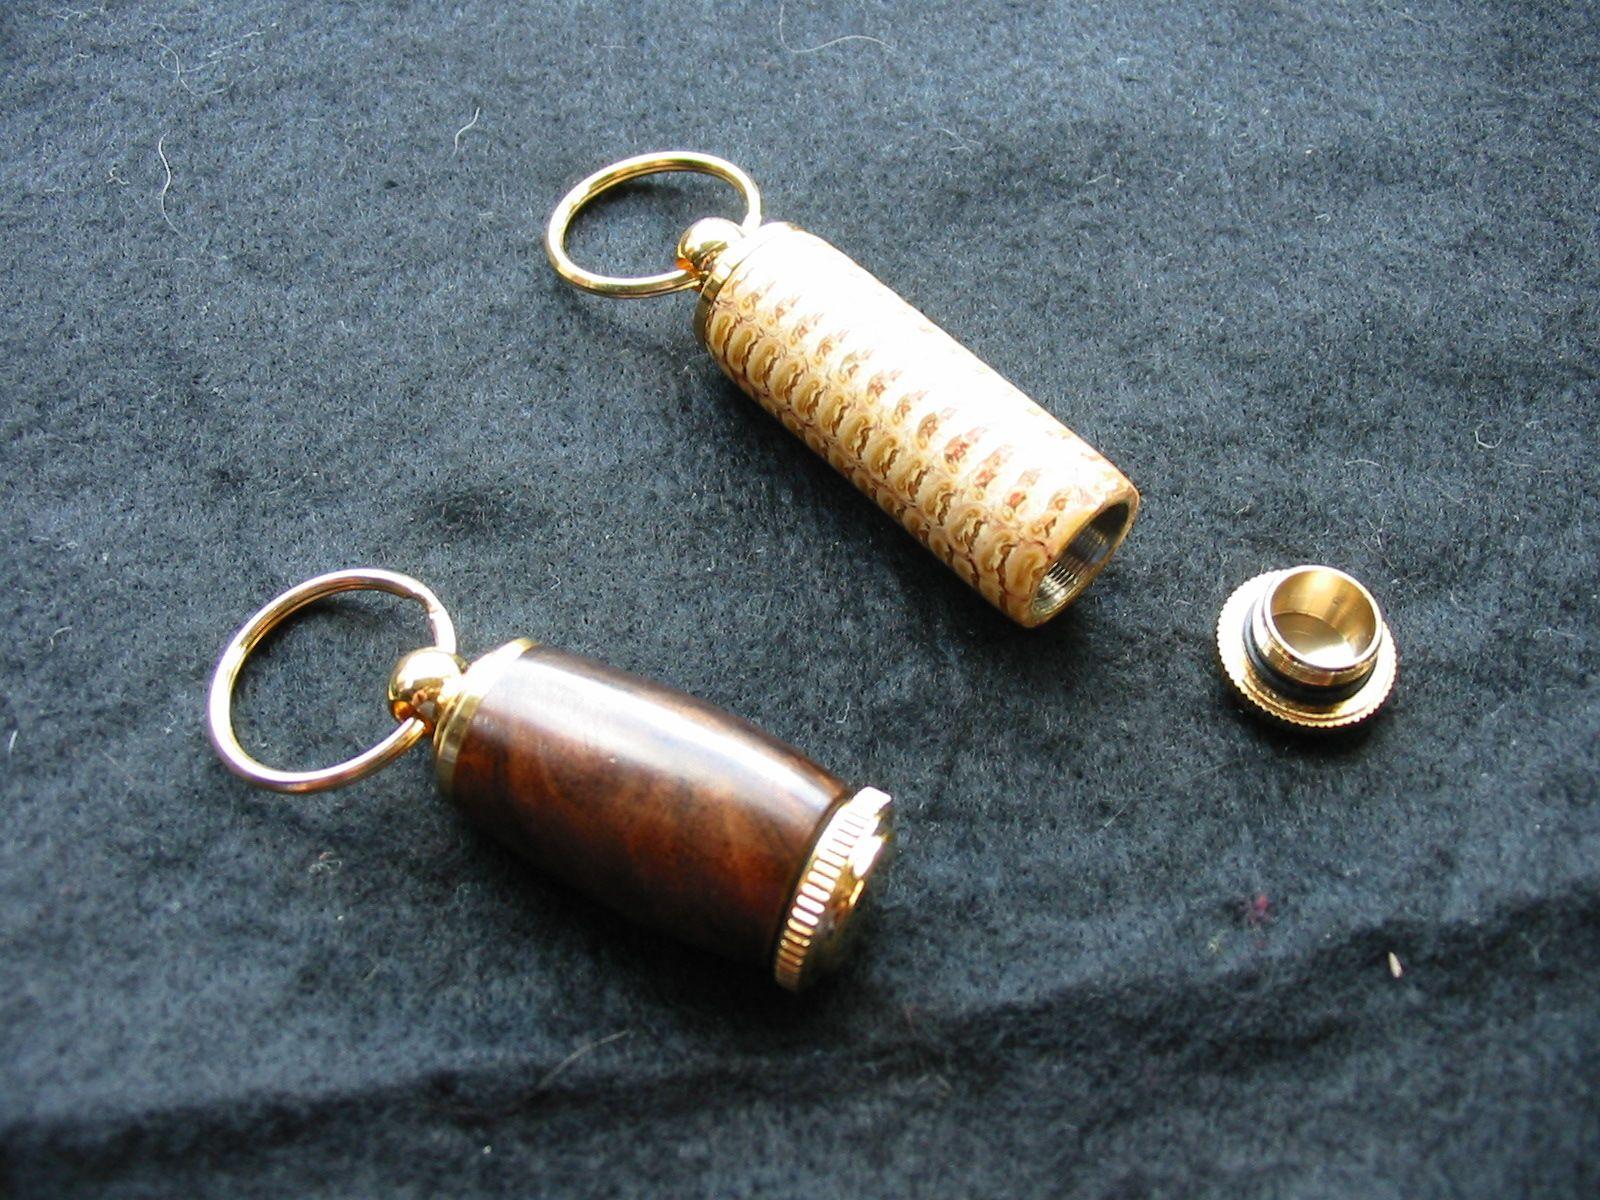 Cob and Walnut Pill Holders